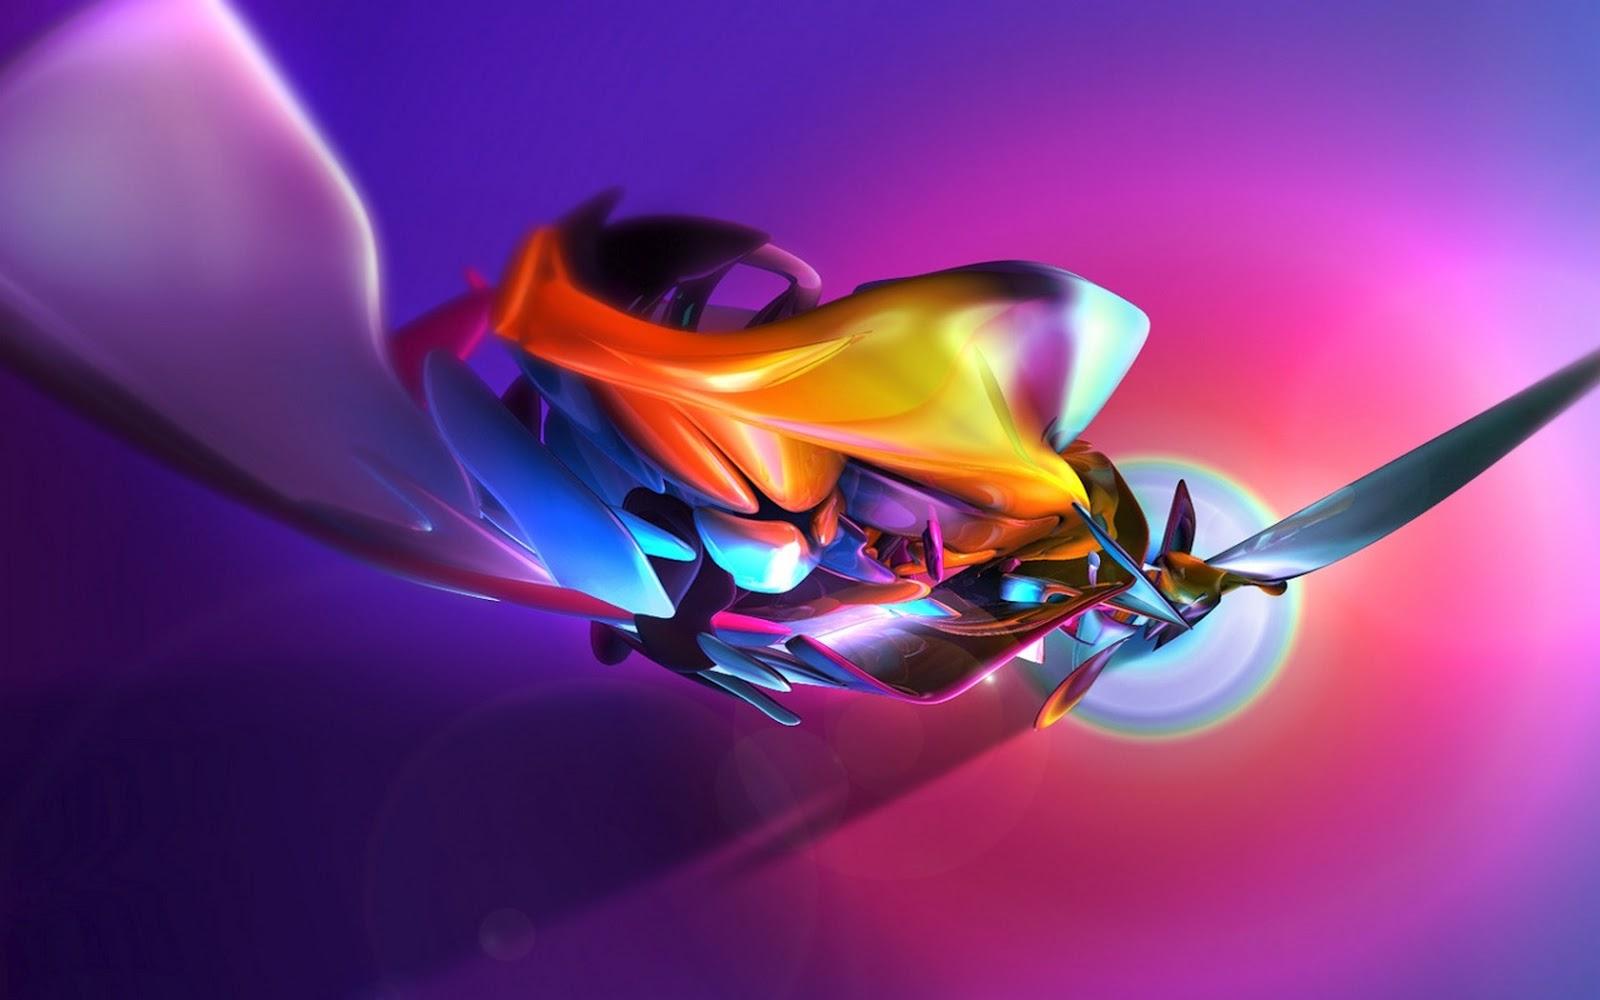 http://4.bp.blogspot.com/-CNFbuc2k2SY/T40RkAPgbGI/AAAAAAAAAmw/KERYKqtuk9E/s1600/colors_abstraction-wide.jpg